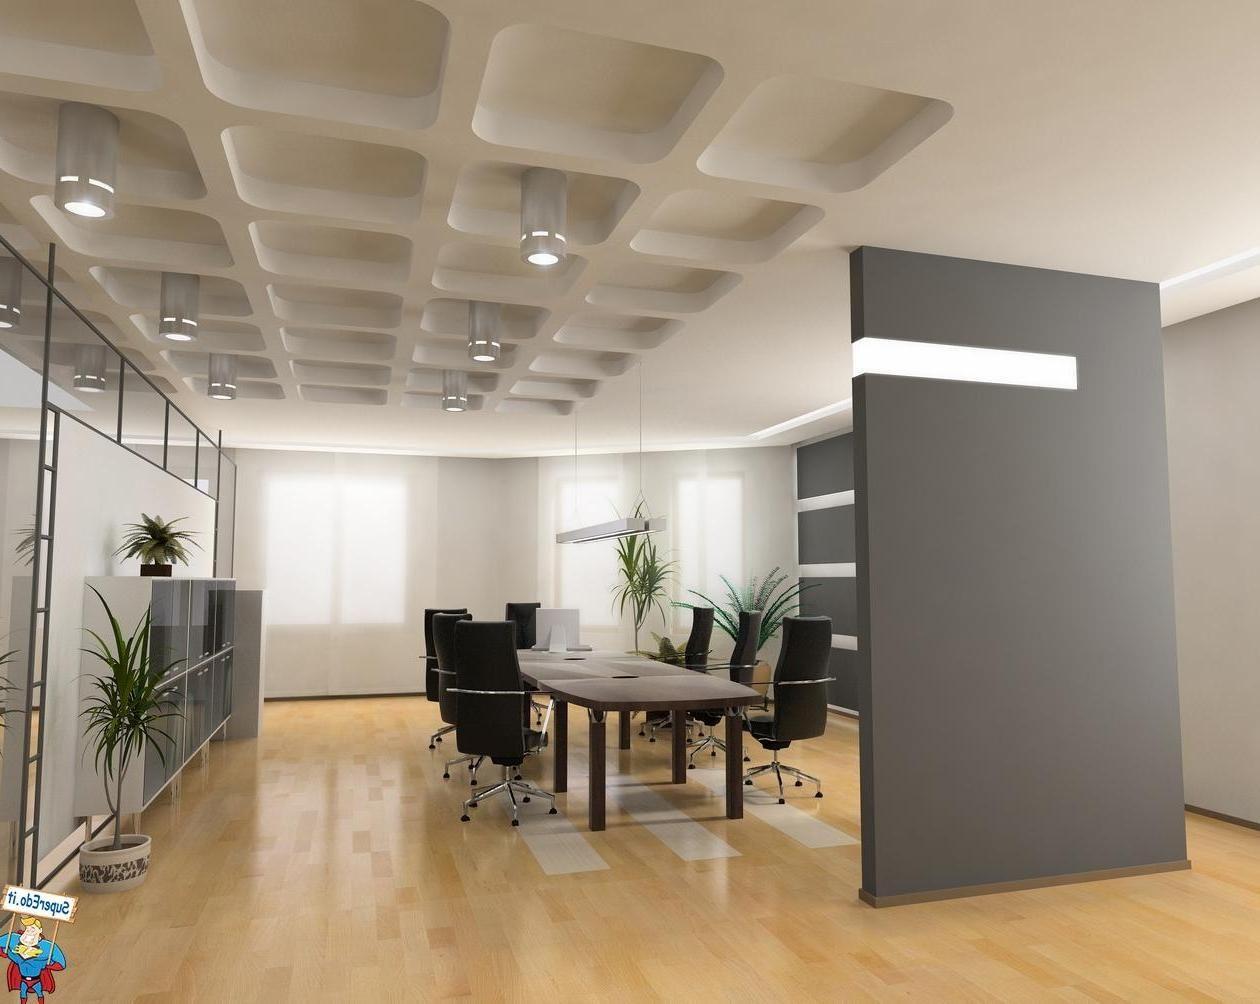 corporate office modern interior design off meetings rooms rh pinterest com